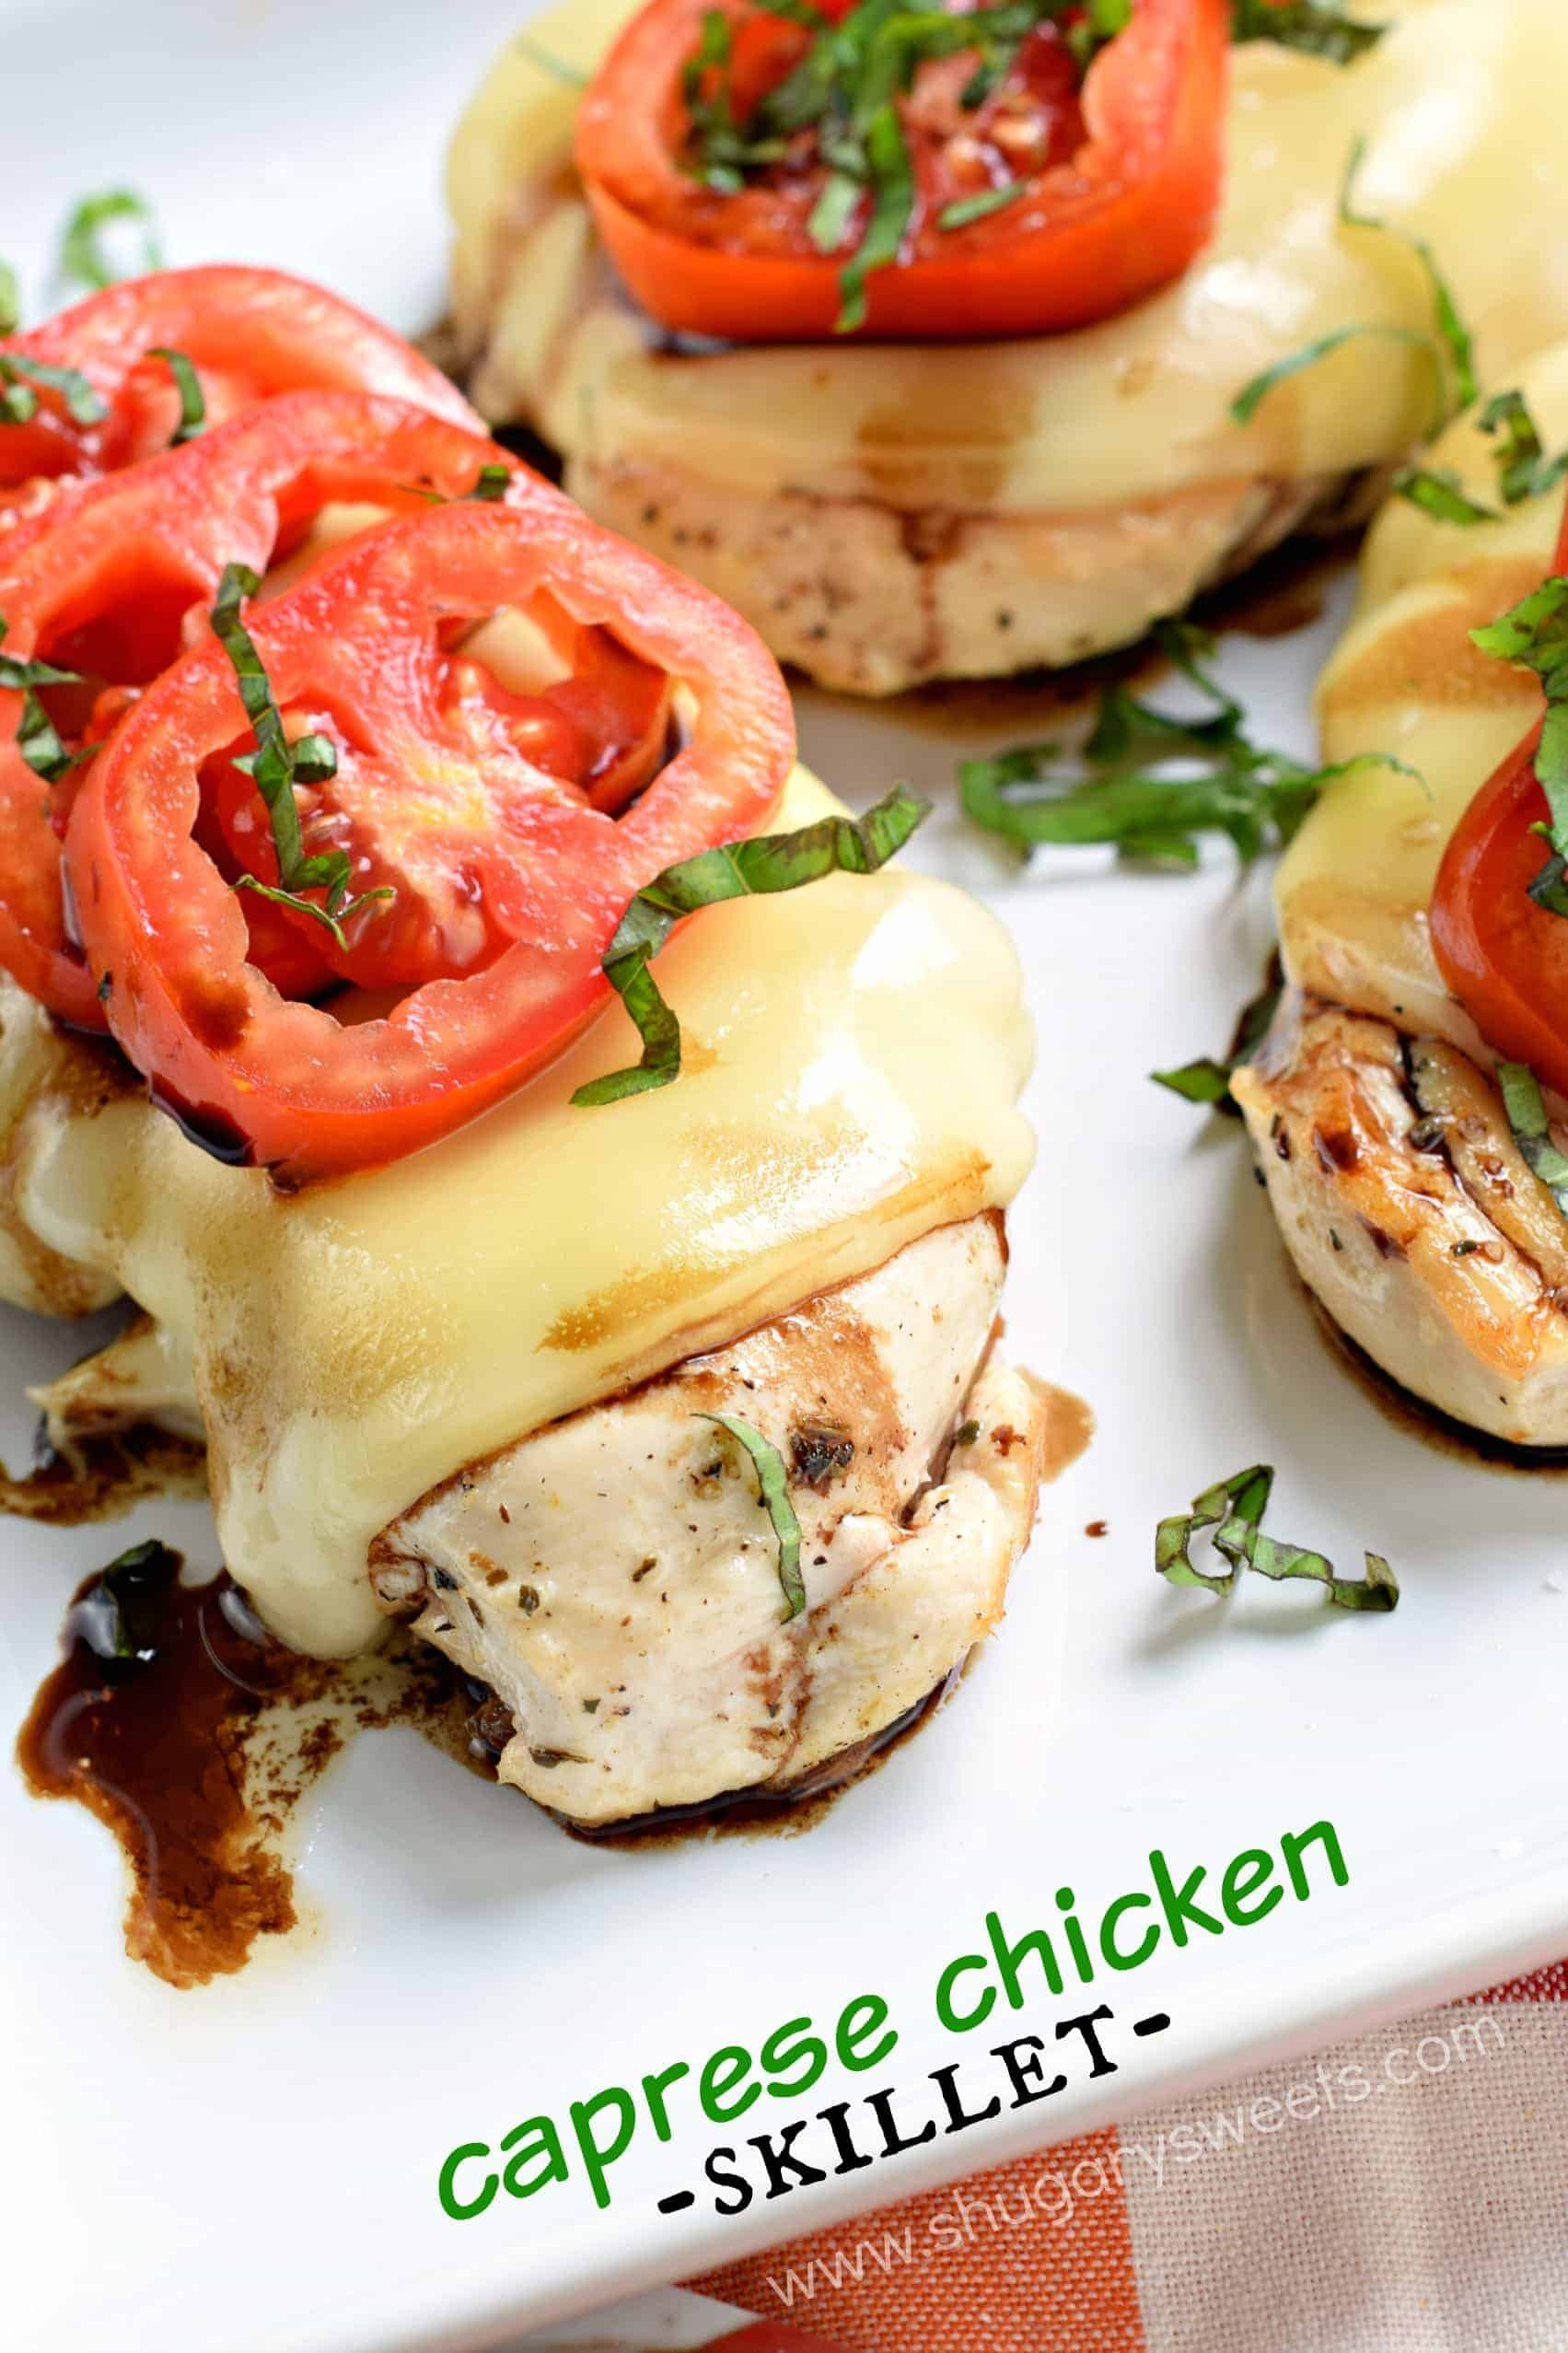 Caprese Chicken Skillet - Shugary Sweets